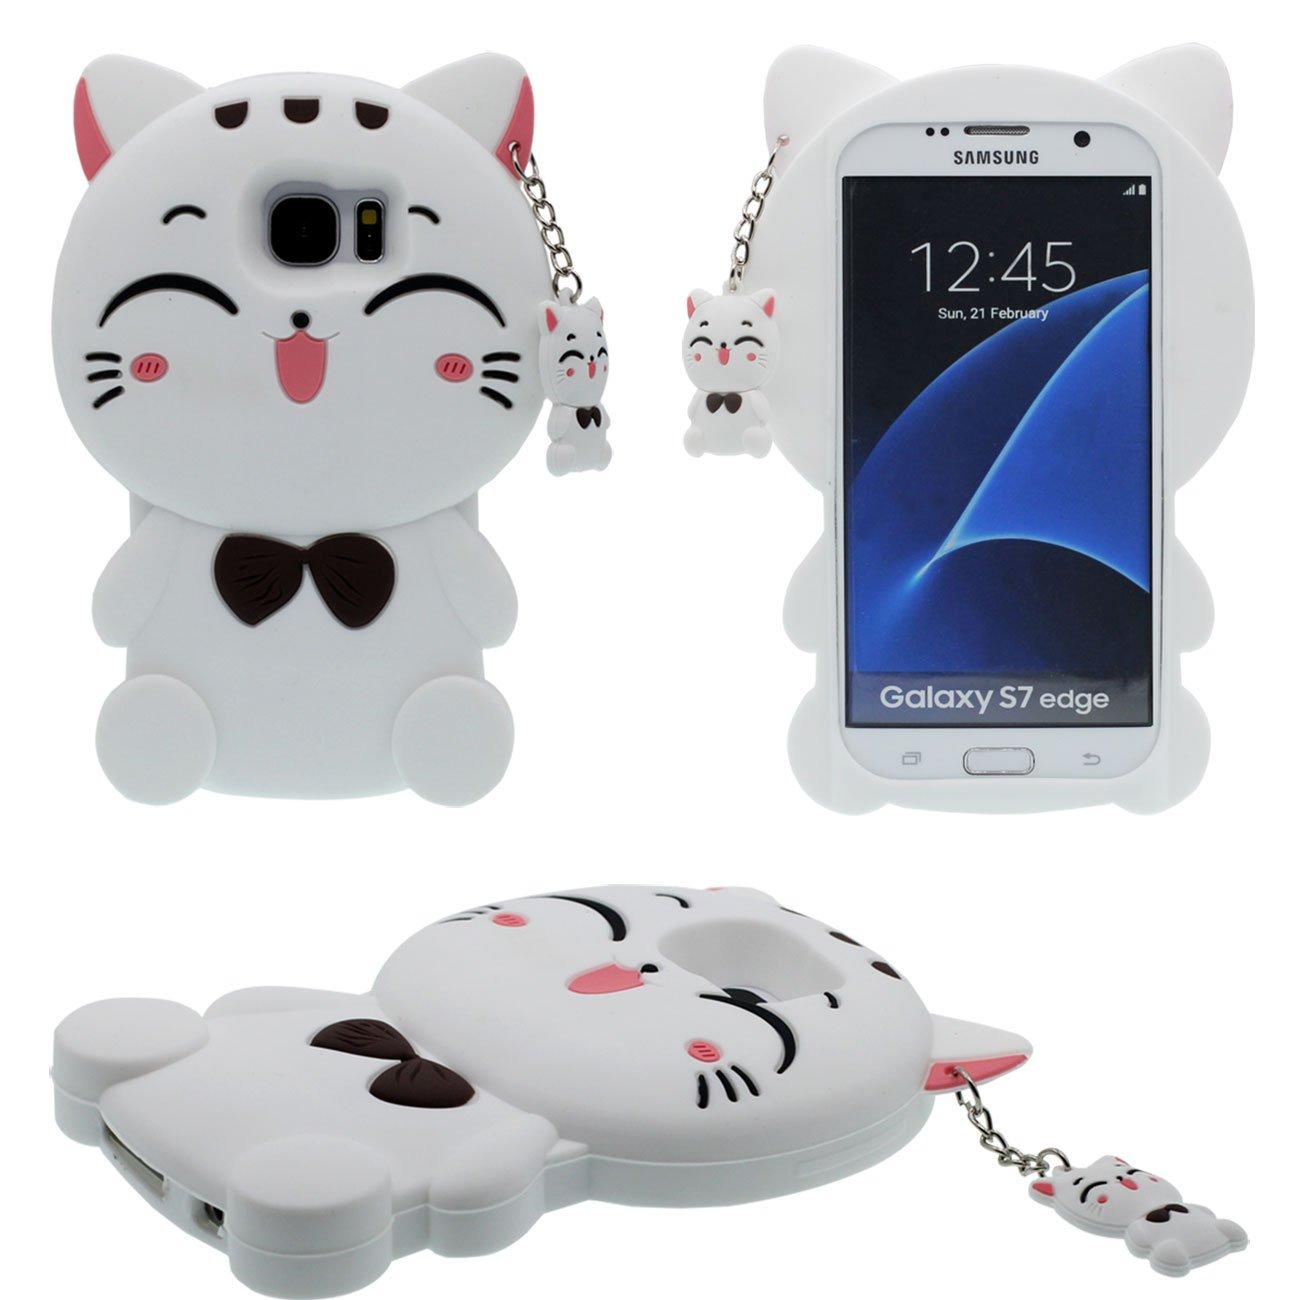 e9d1e18a516936 Galaxy S7 Edge Coque, Cartoon Case 3D Charmant Kitty Chat Forme Chat  Pendentif Désign Doux